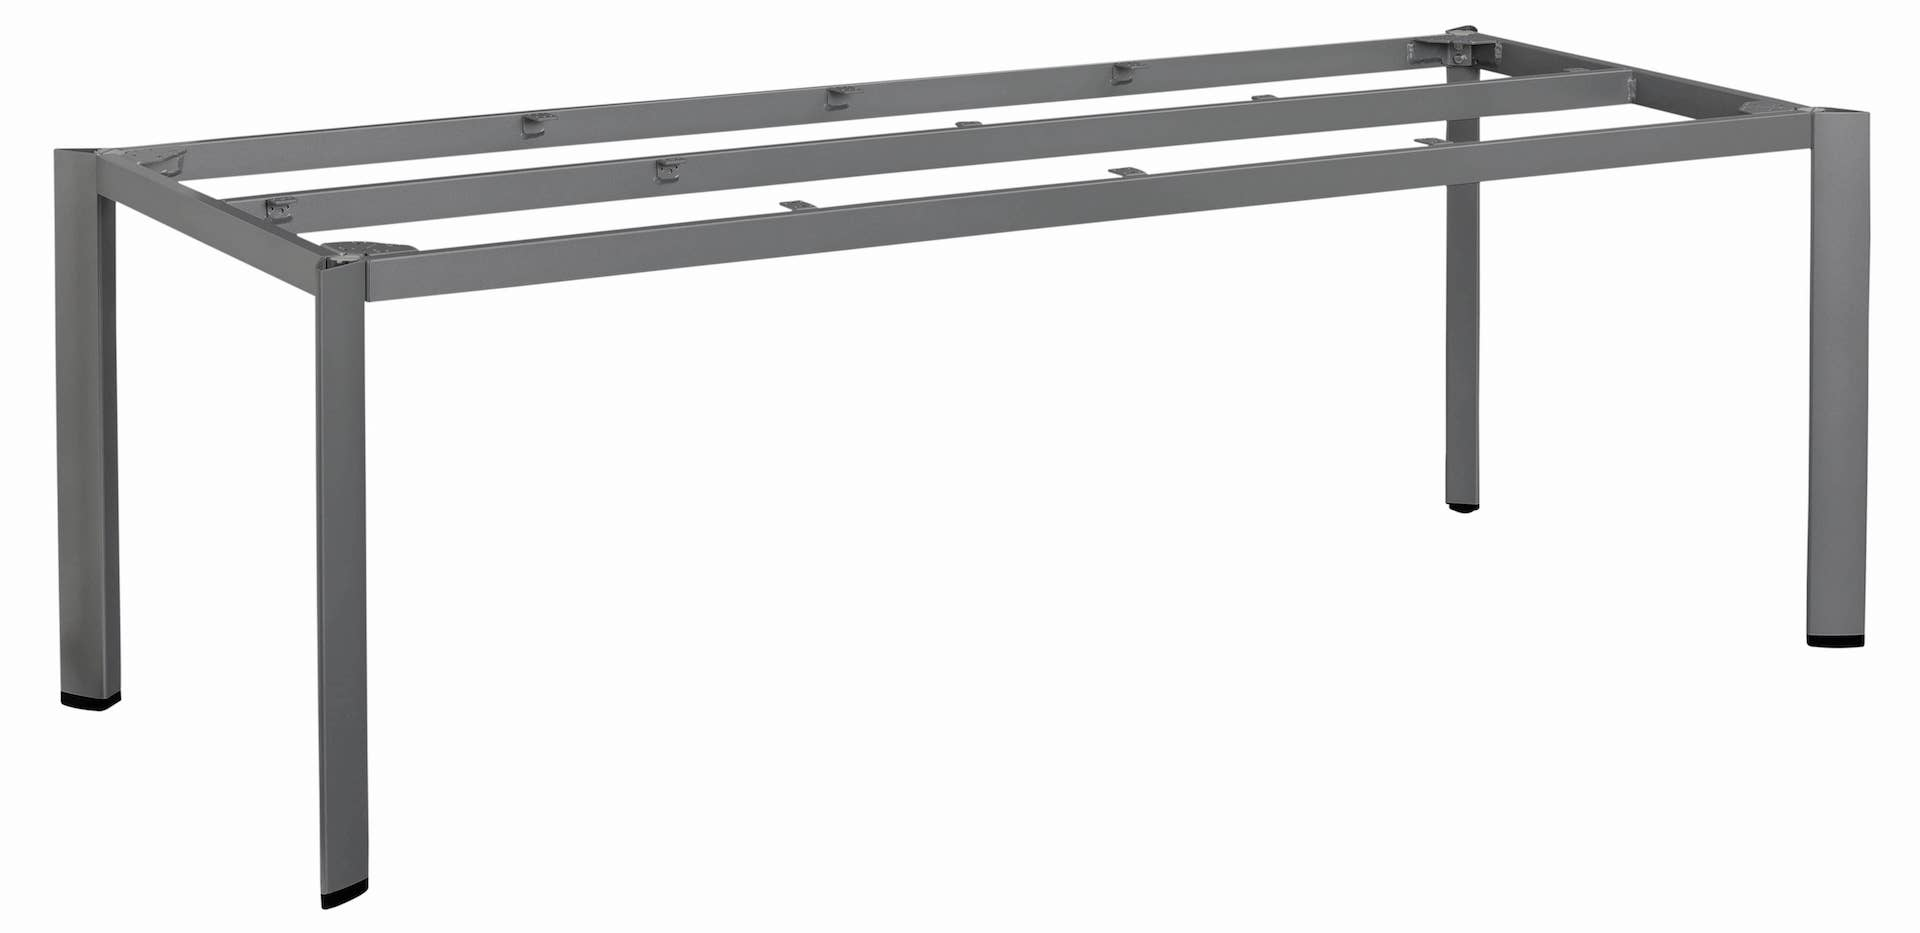 EDGE Tischgestell 220 x 95 cm